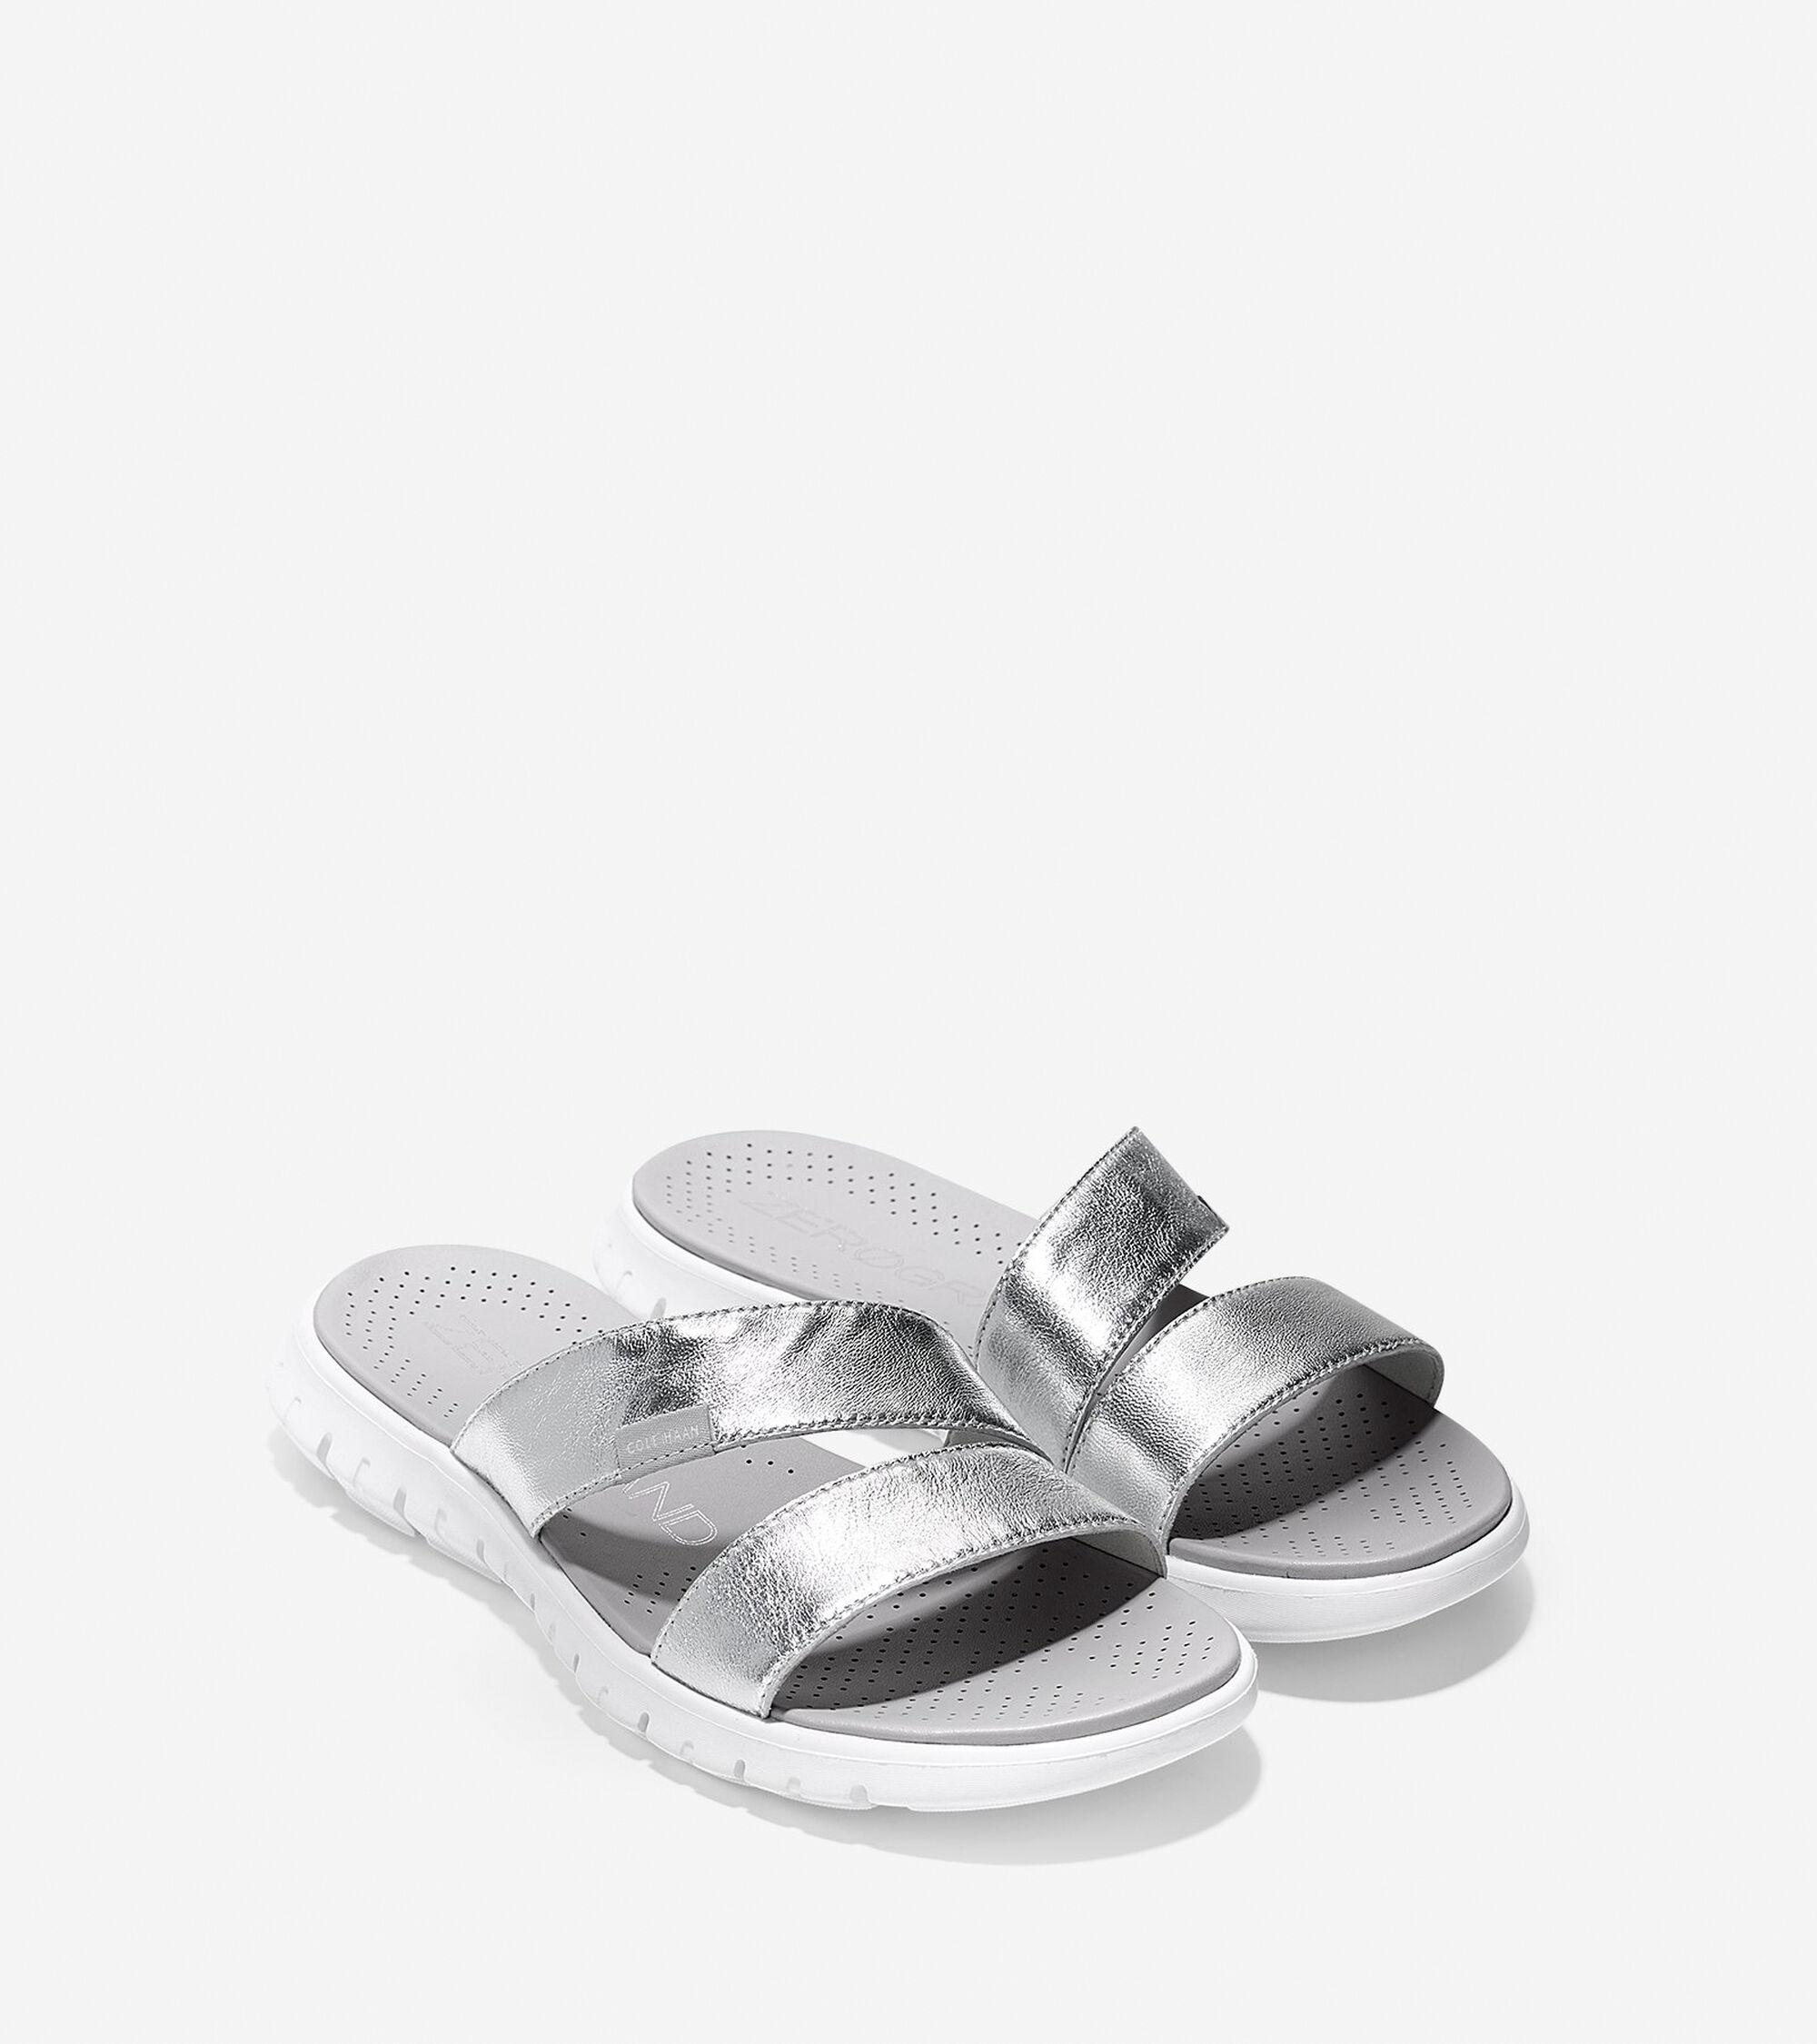 White sandals -  Women S Zer Grand Two Strap Sandal